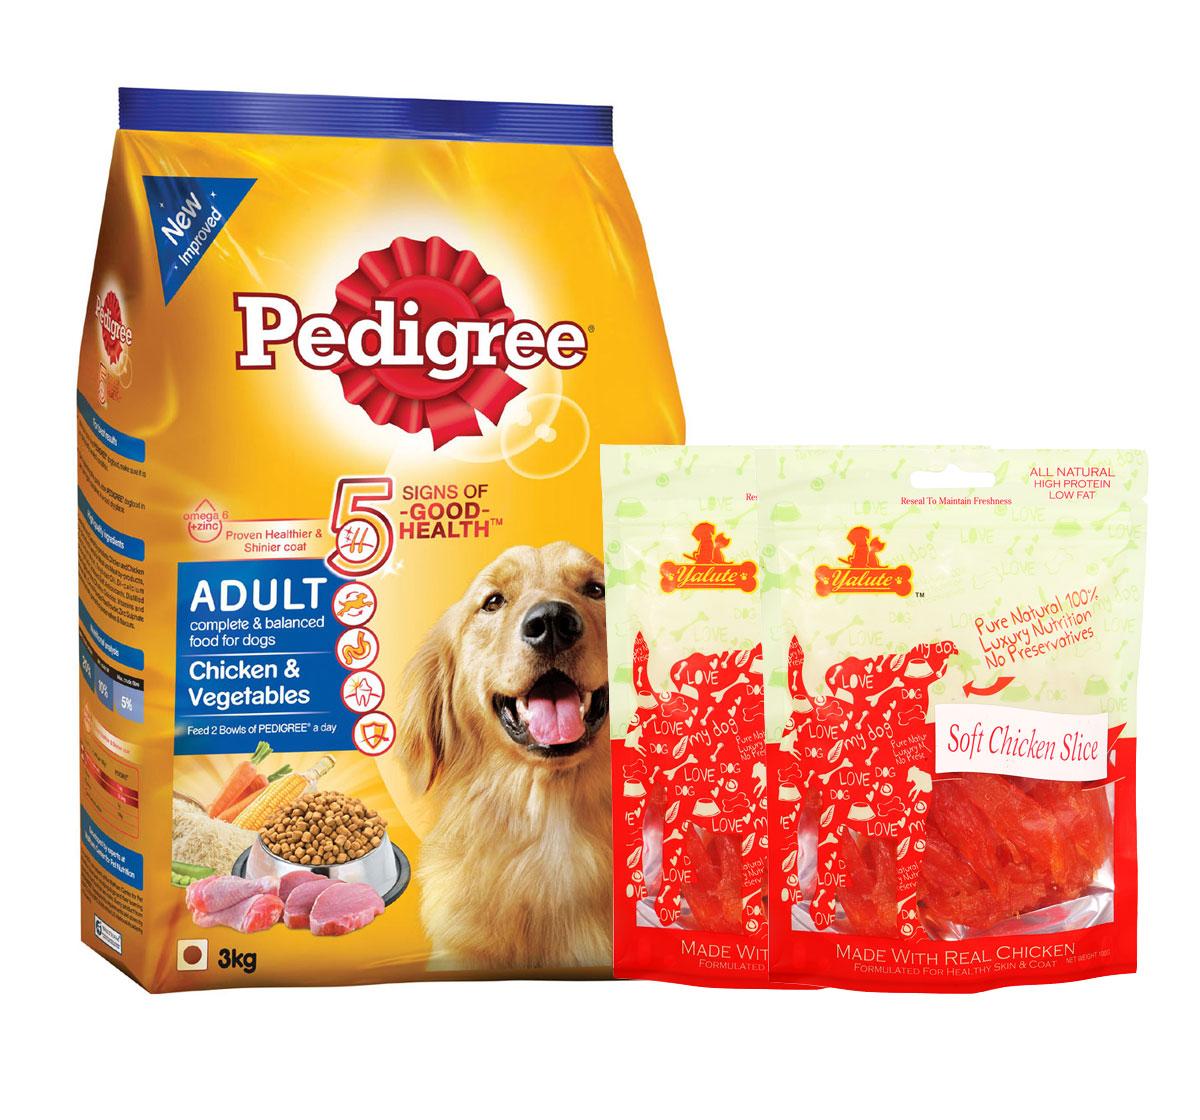 Pedigree Adult Dog Food Chicken & Vegetables - 3 Kg  With Chicken Slices